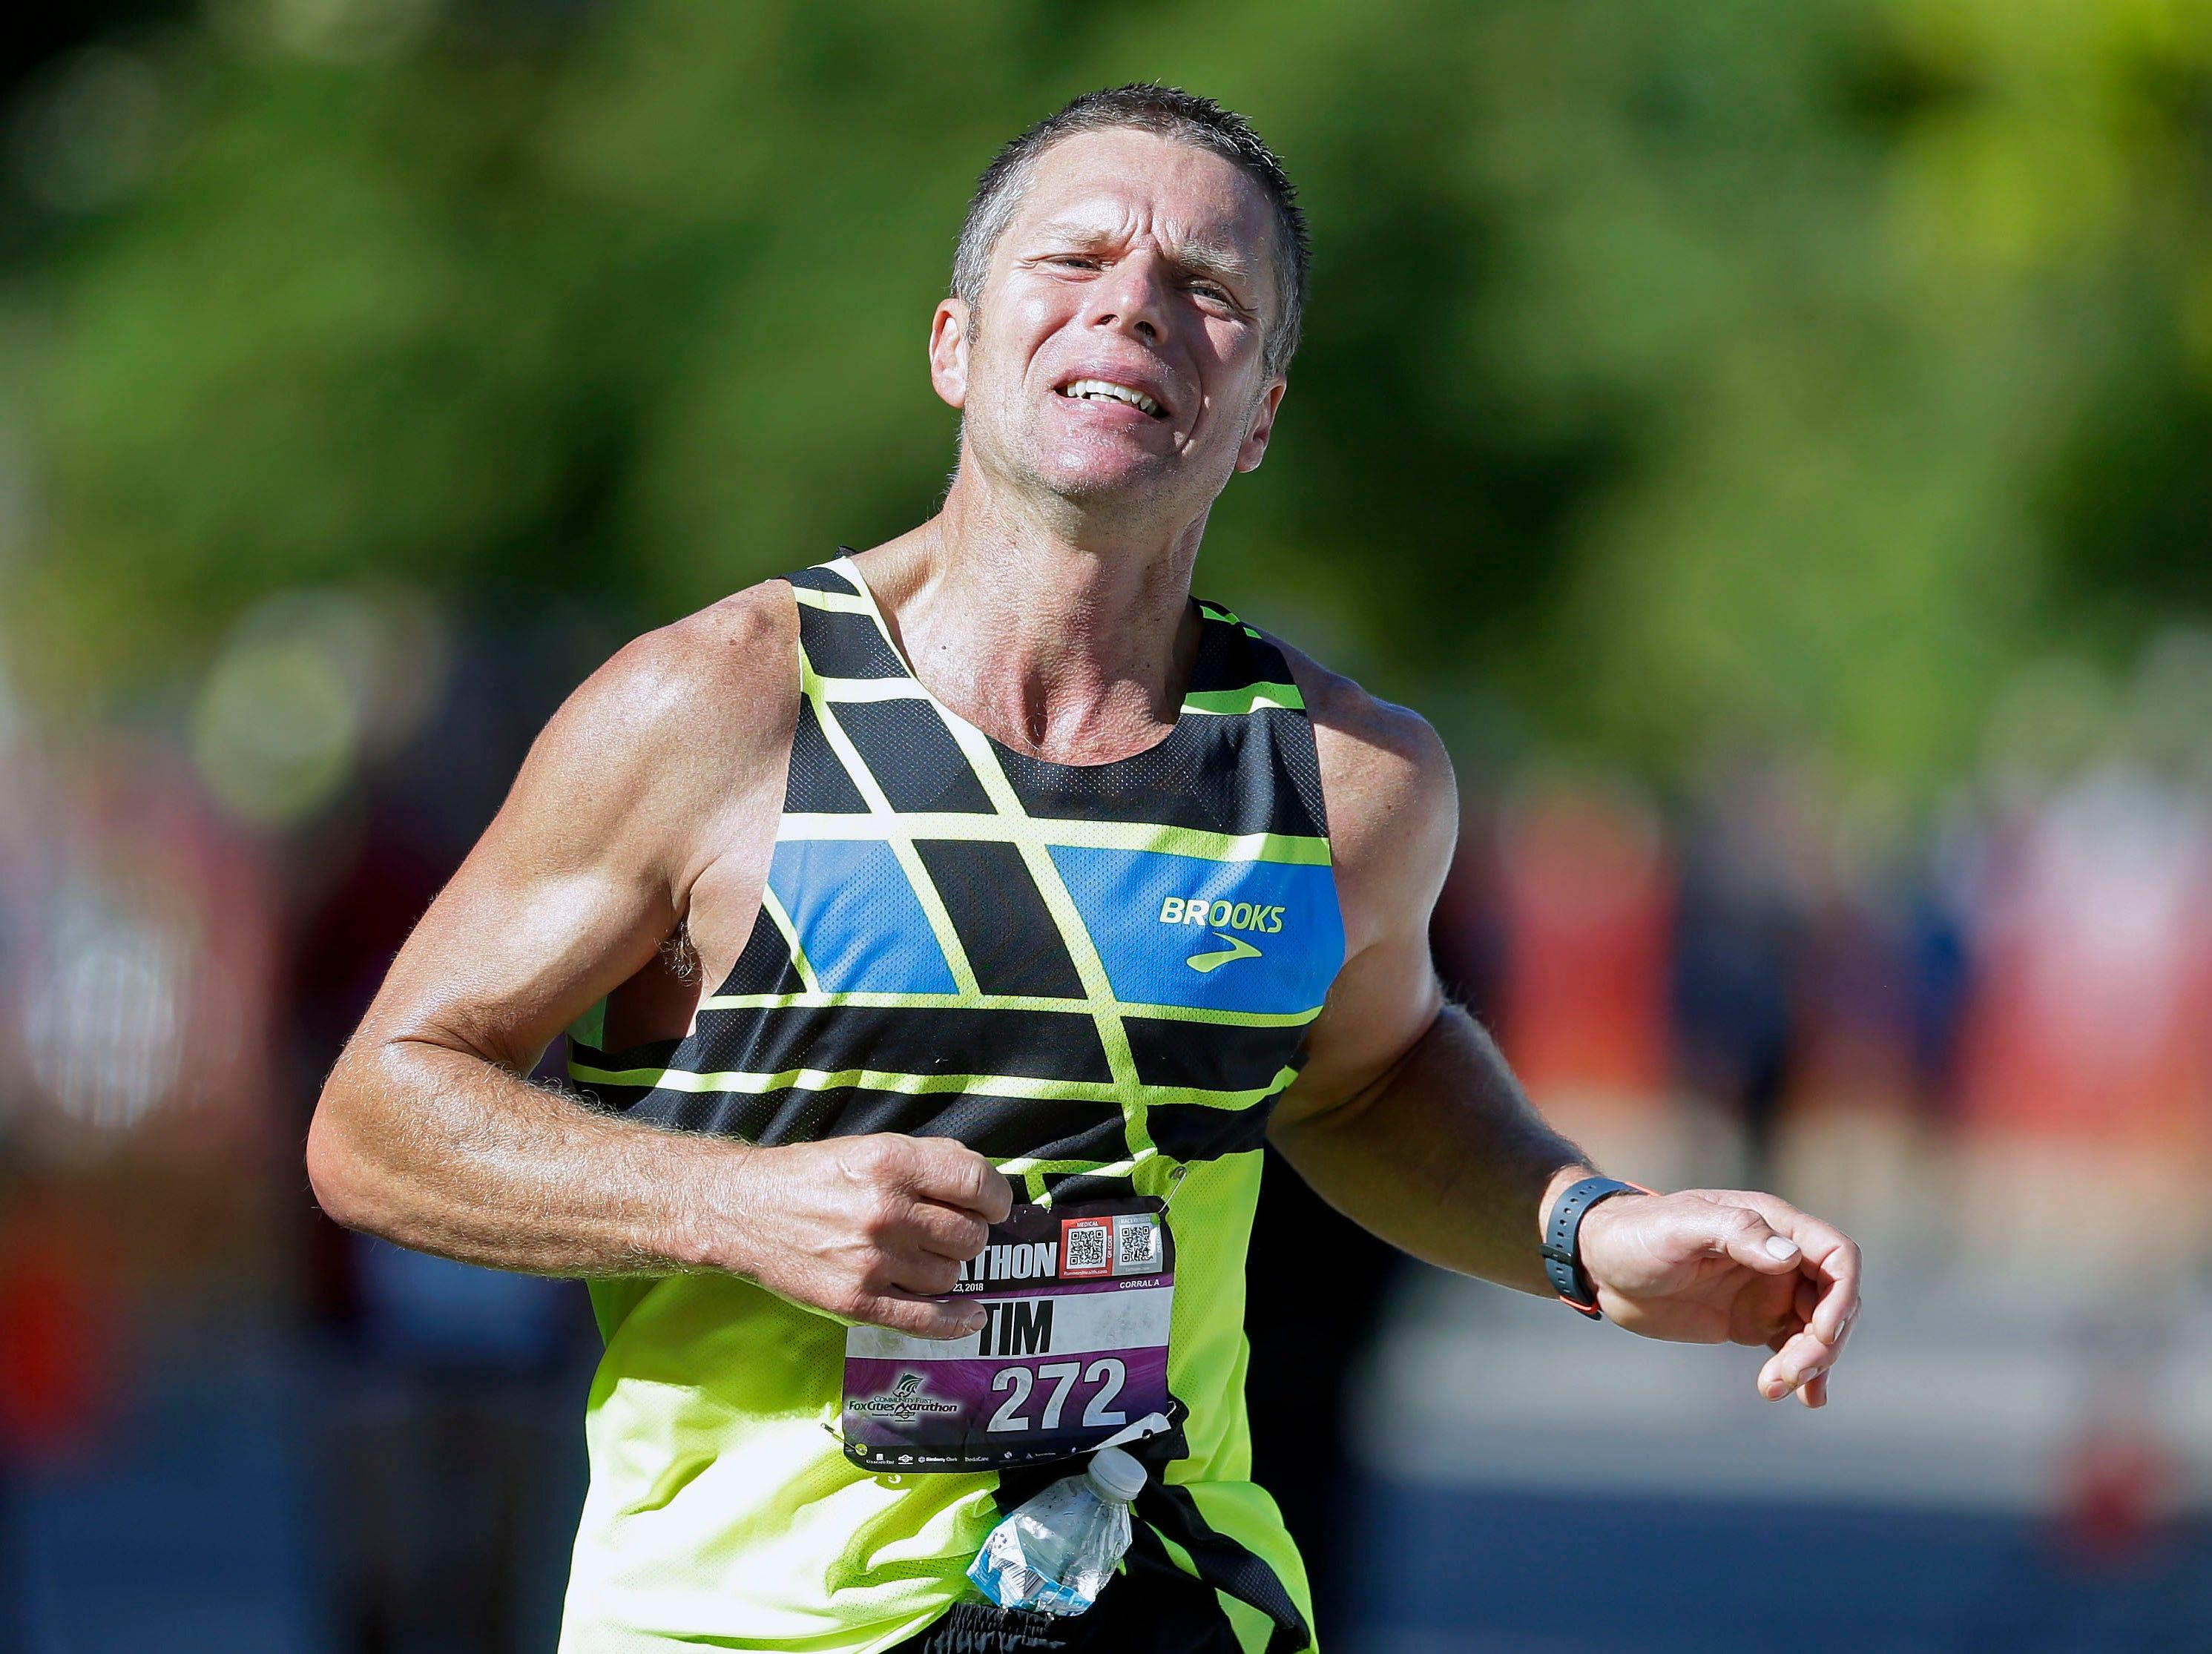 Tim Maass finishes the Community First Fox Cities Marathon Sept. 23, 2018, across the Fox Cities.